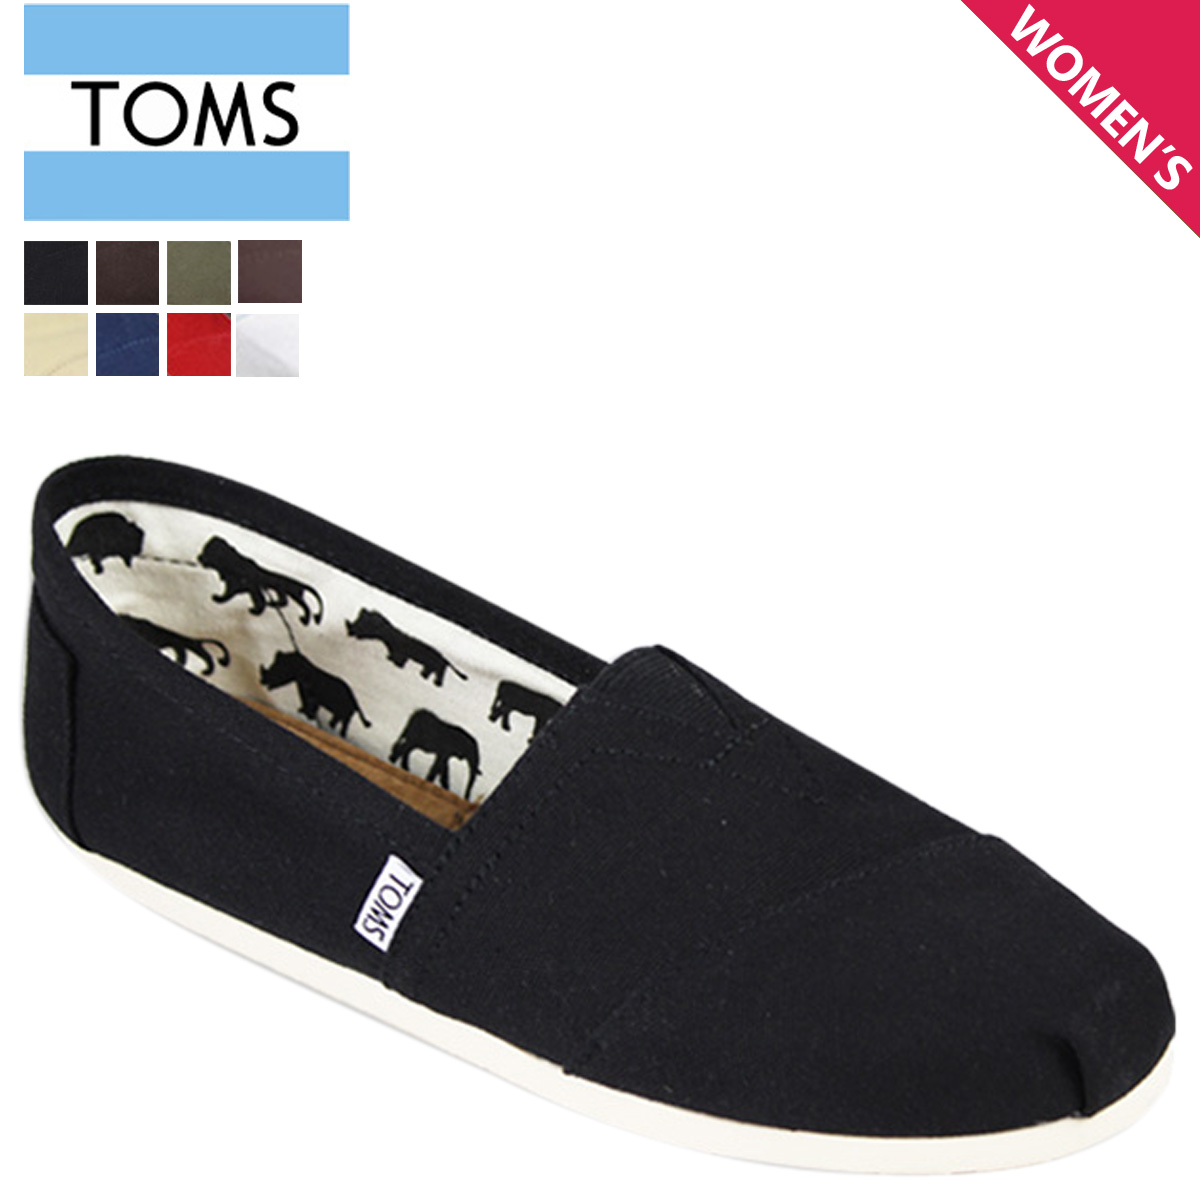 cd12a6adb00e Whats up Sports  WOMEN S CLASSICS Toms Toms shoes